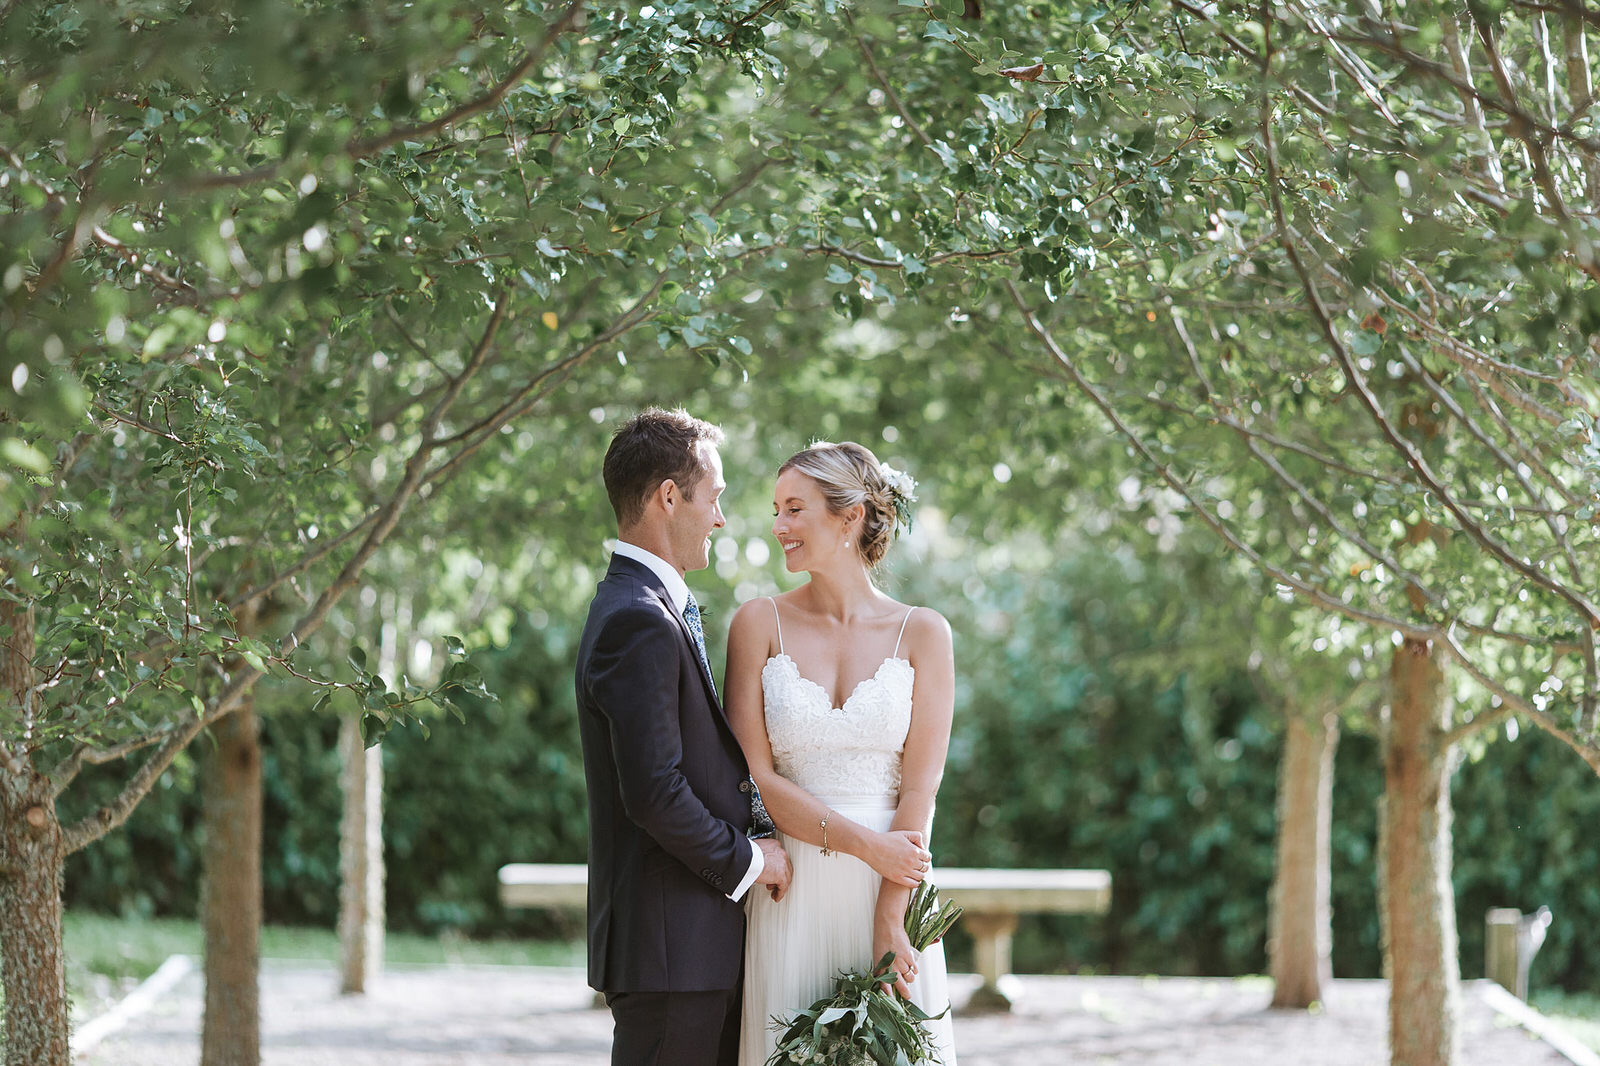 newfound-r-s-ataahua-garden-venue-tauranga-wedding-104-1